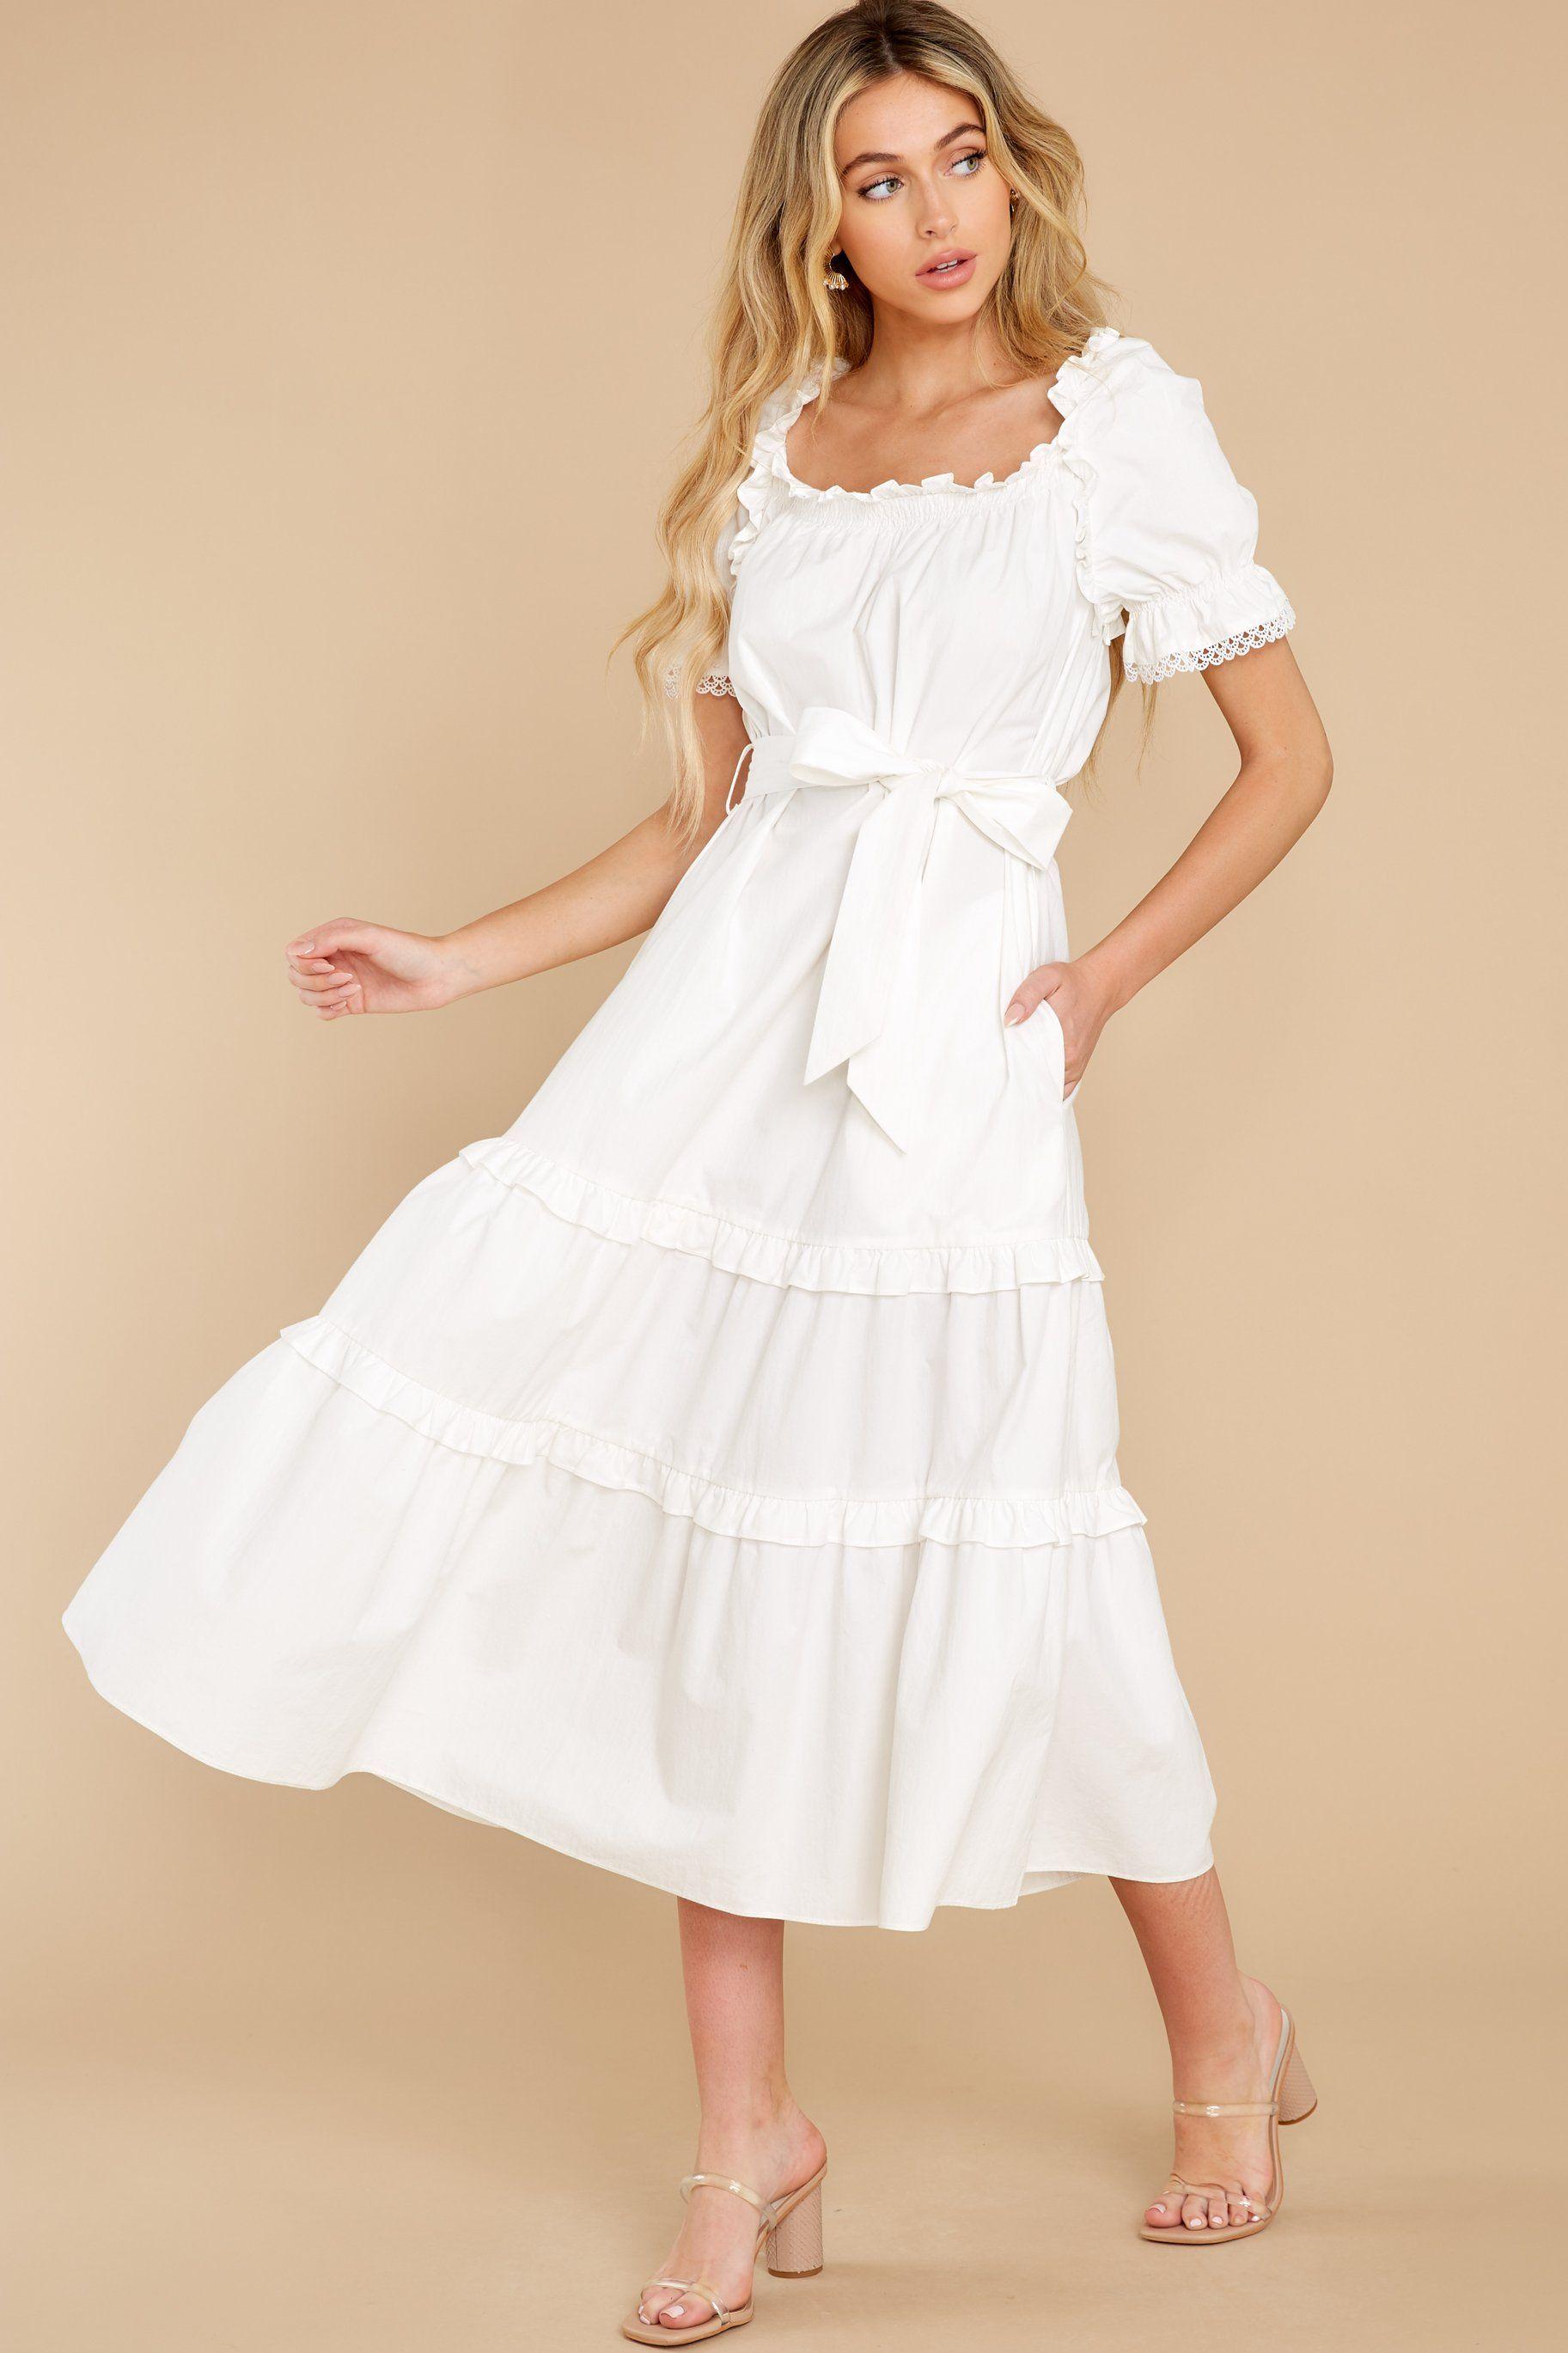 Positively Charmed White Maxi Dress Maxi Dress Pattern Dresses Maxi Dress Wedding [ 2738 x 1825 Pixel ]